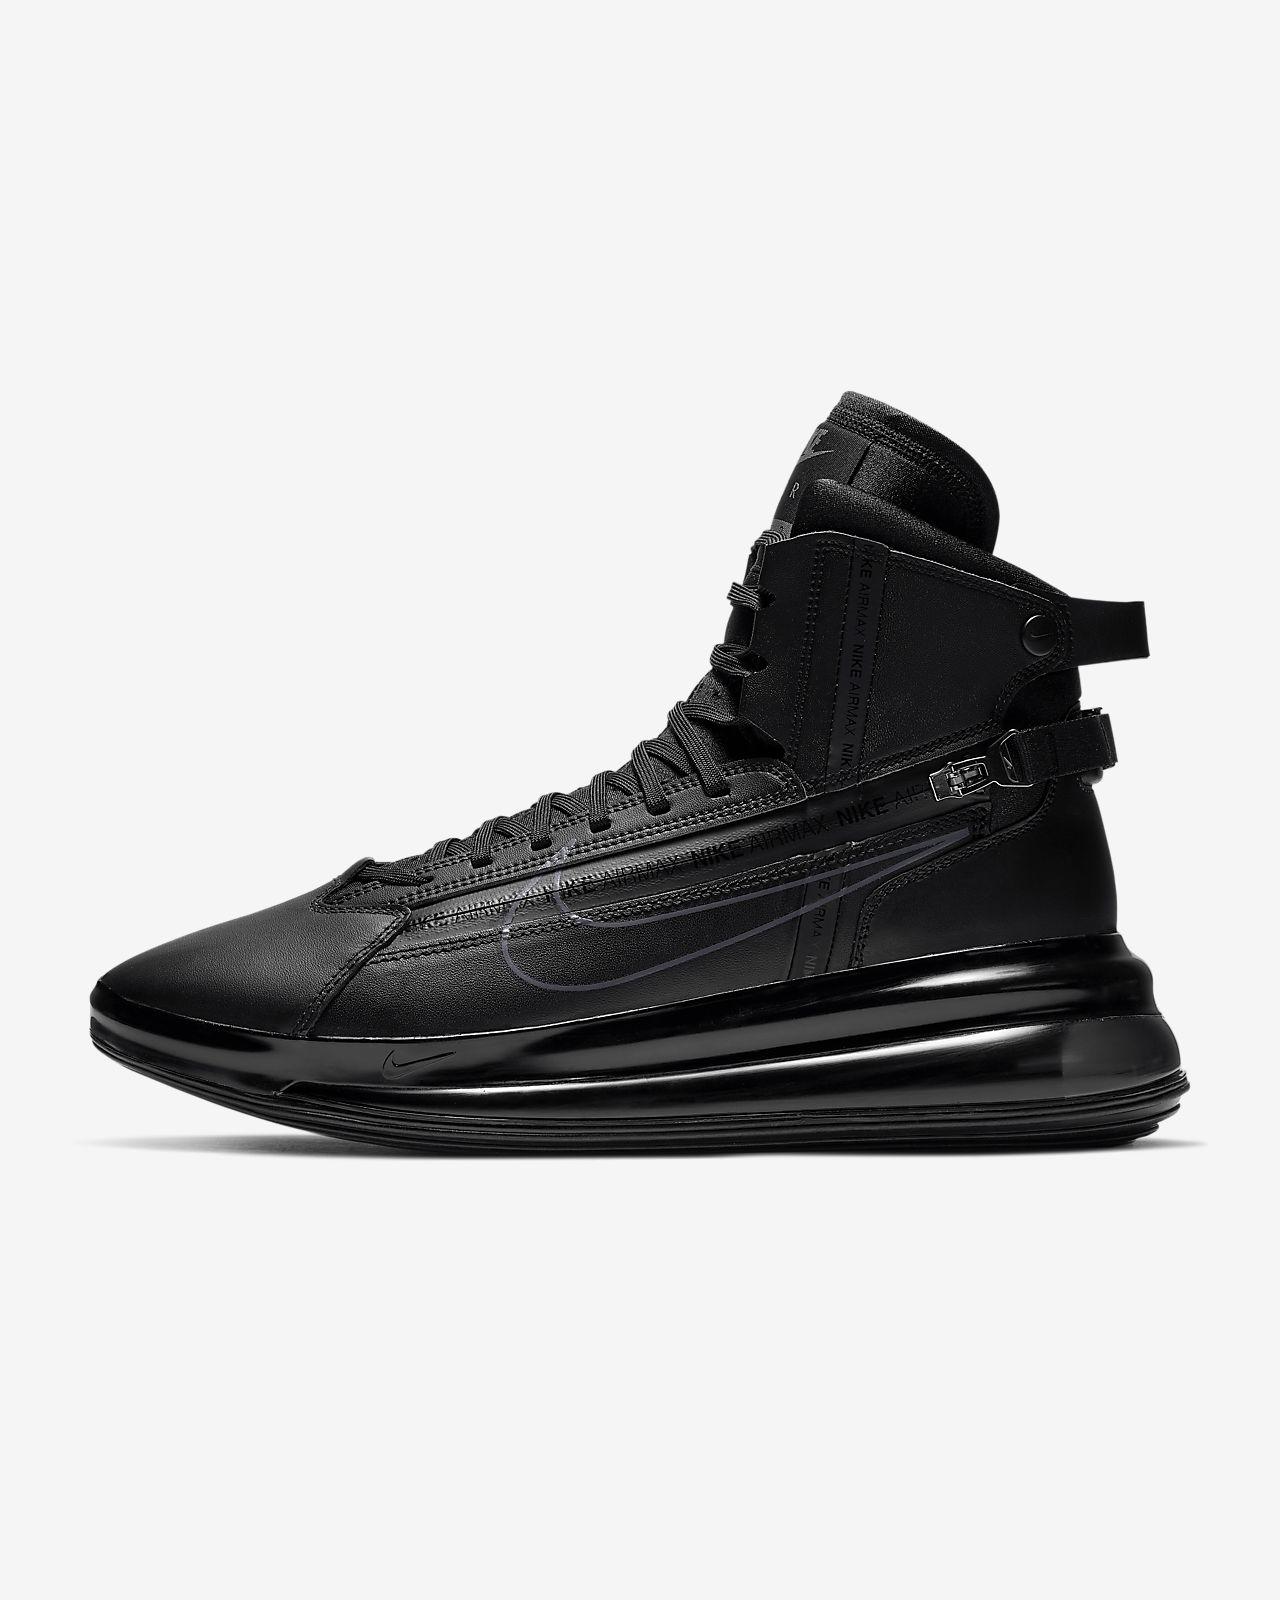 free shipping 3dddf f3b0d ... Nike Air Max 720 SATRN Men s Shoe